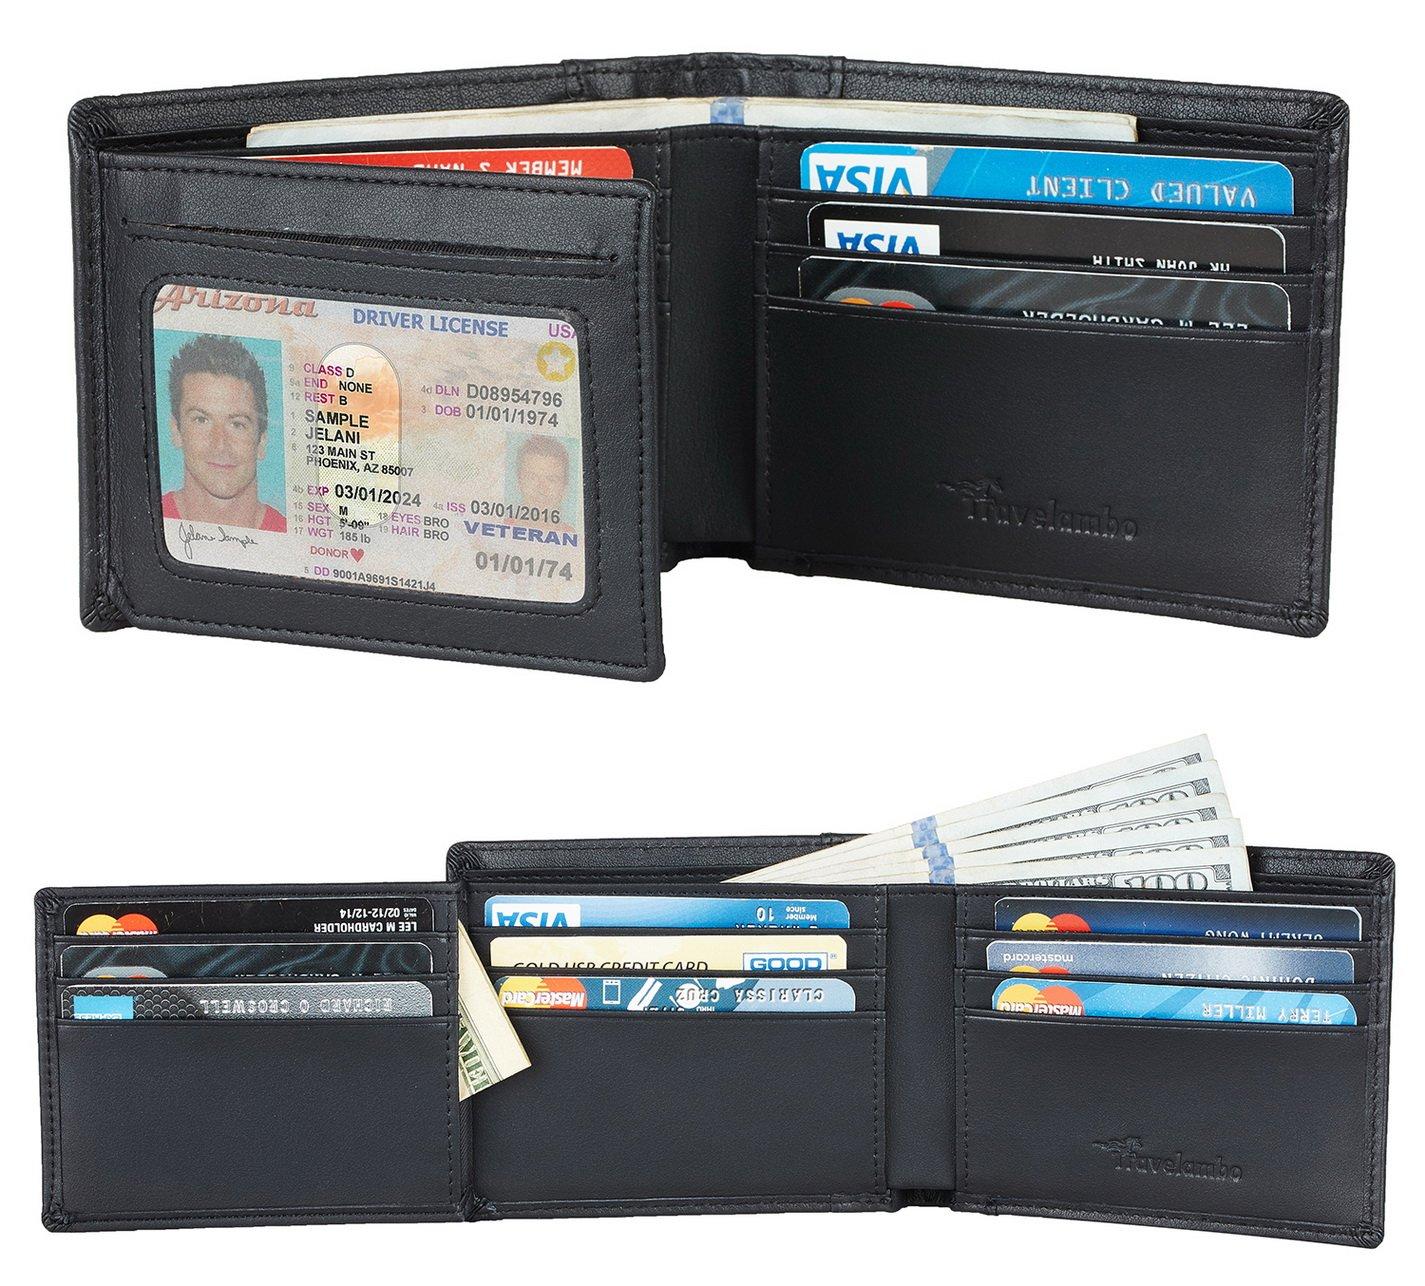 Travelambo Genuine Leather RFID Blocking Wallets Mens Wallet Bifold Left ID (napa black)